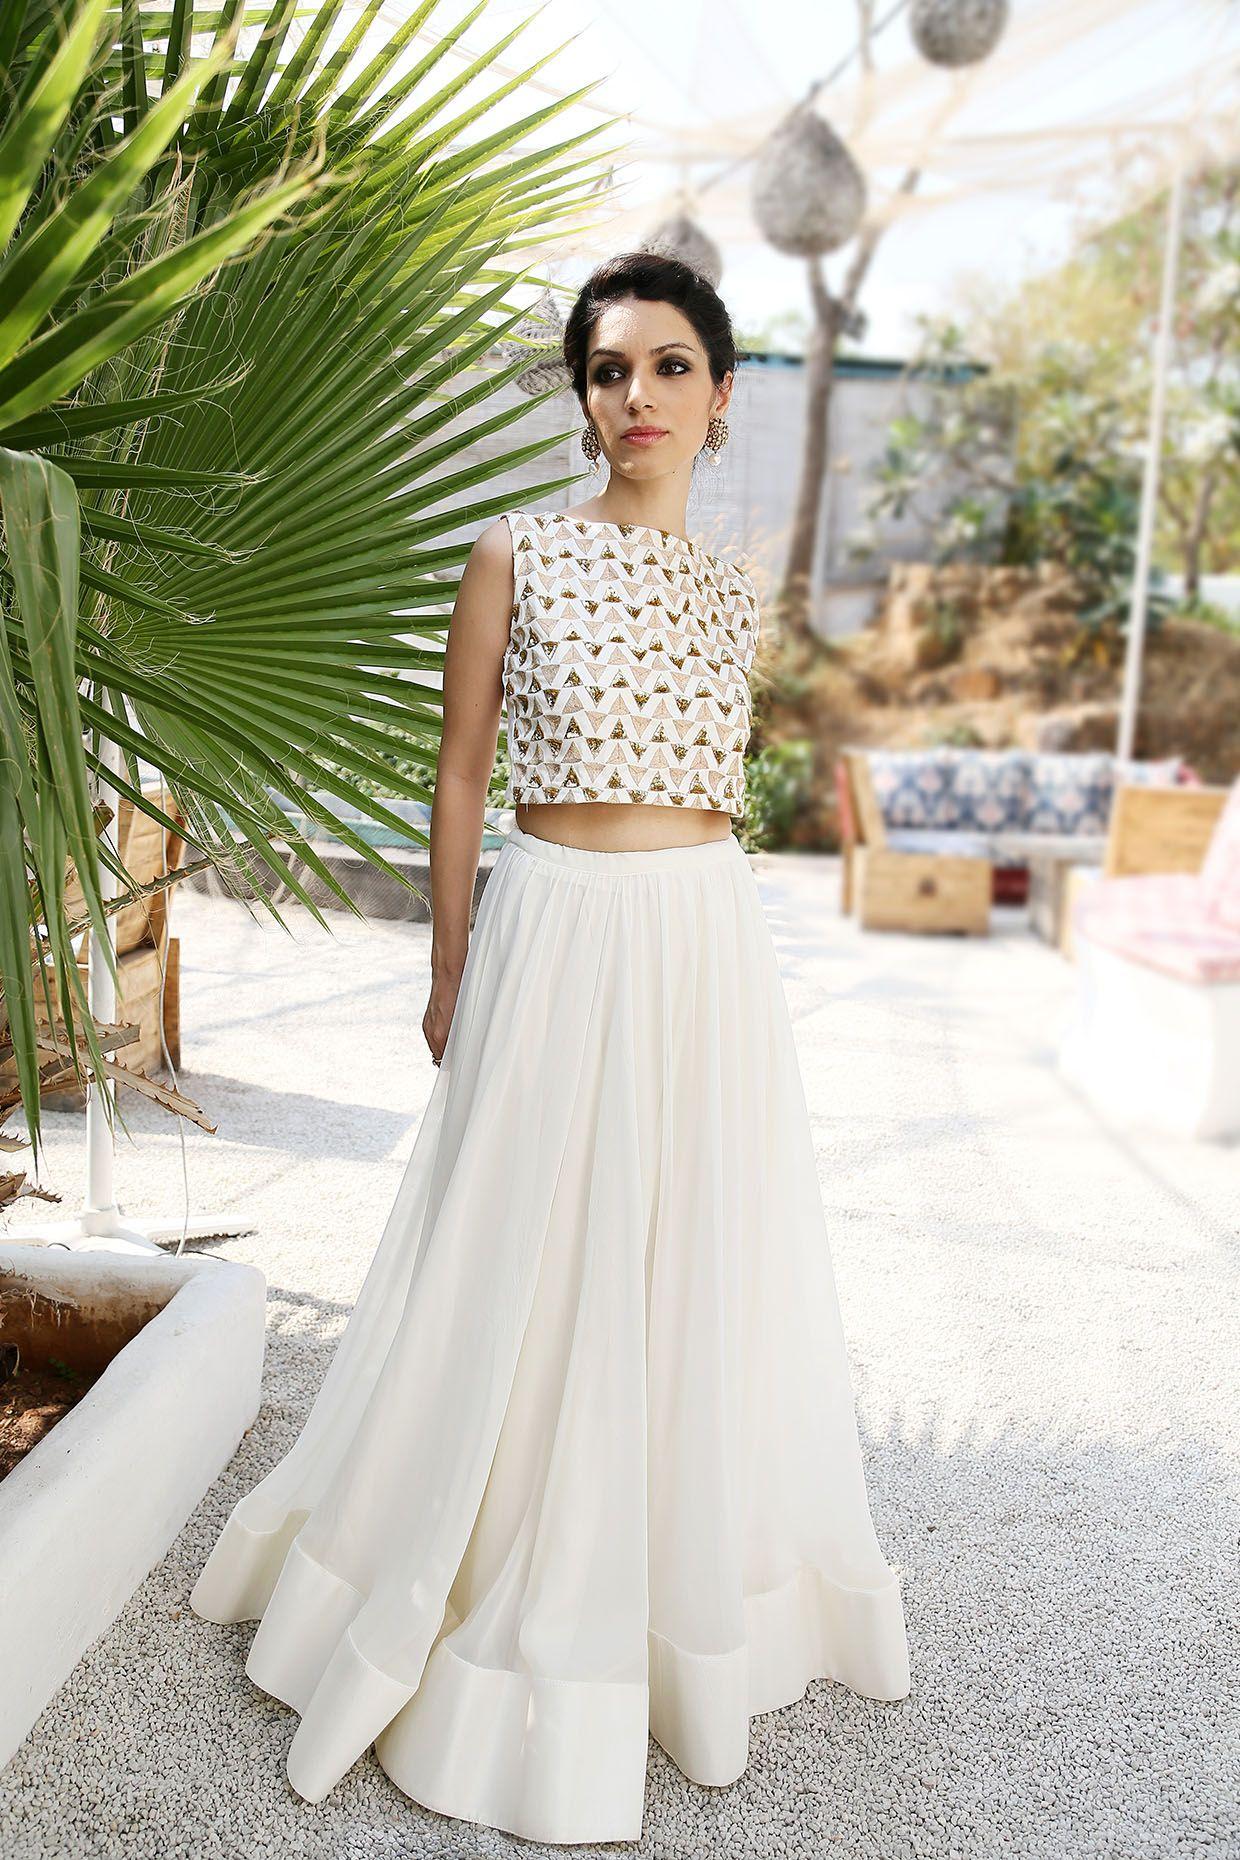 Prathyusha Garimella (With images) Indian skirt, Indian